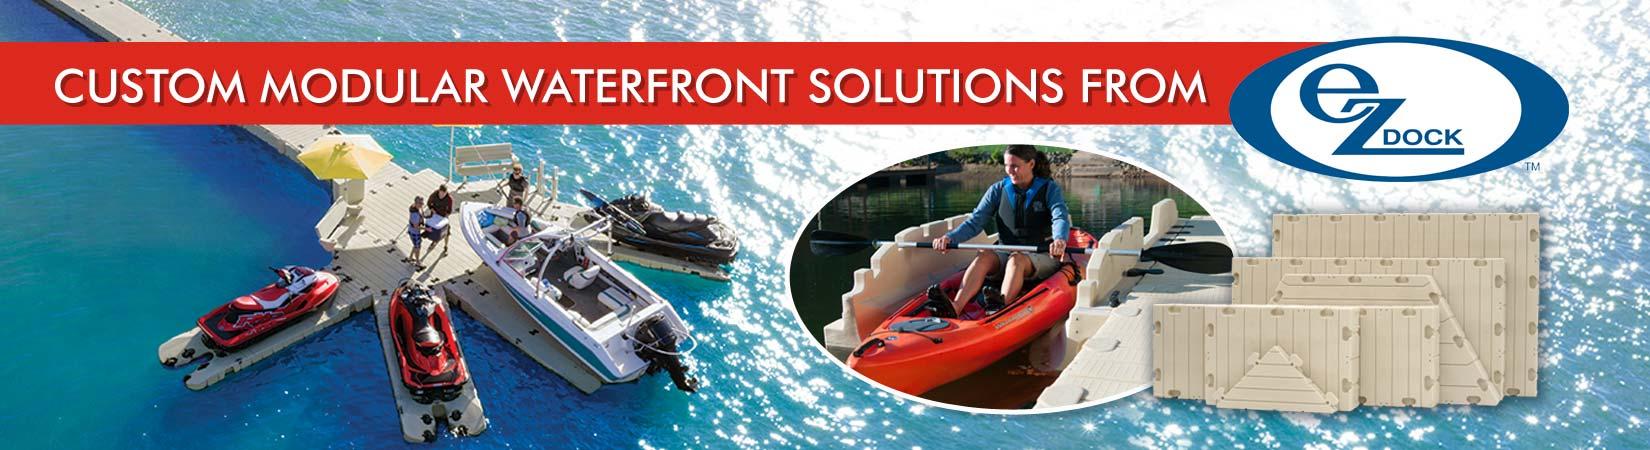 EZ Dock Products slide